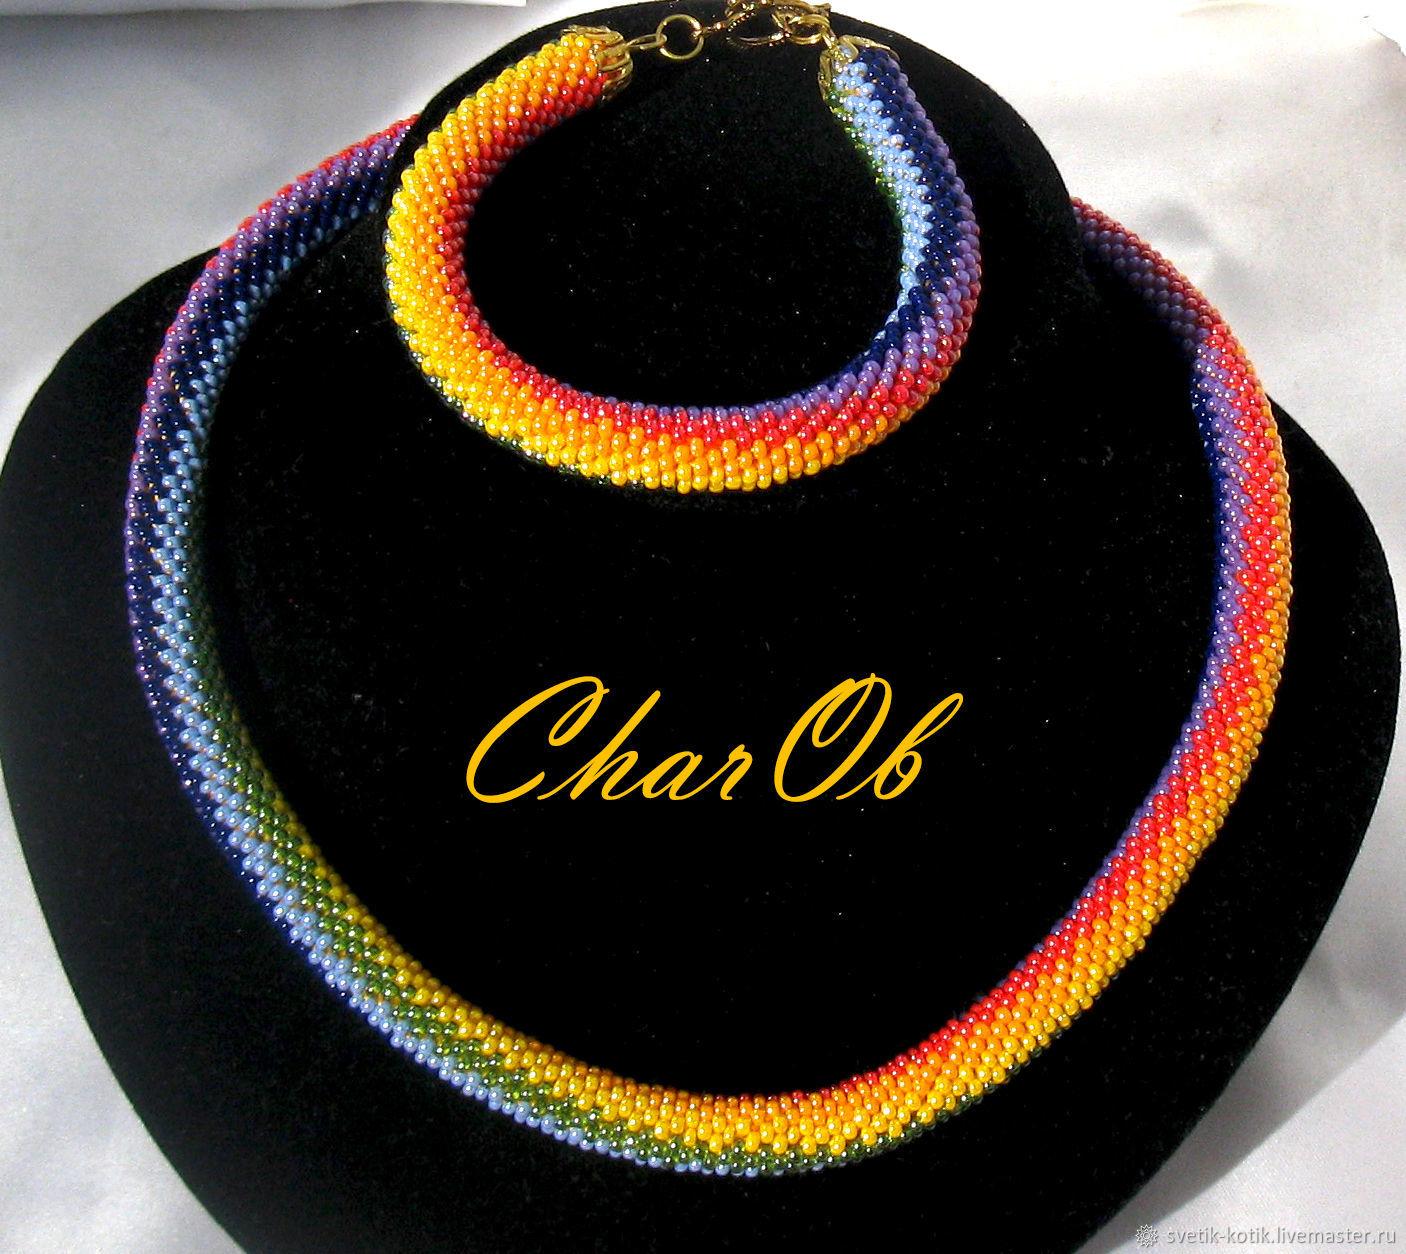 choker necklace rainbow necklaces rainbow set necklace bracelet gift decoration rainbow necklace and bracelet set rainbow 7 colors rainbow flower necklace beaded necklace beaded harness necklace summe